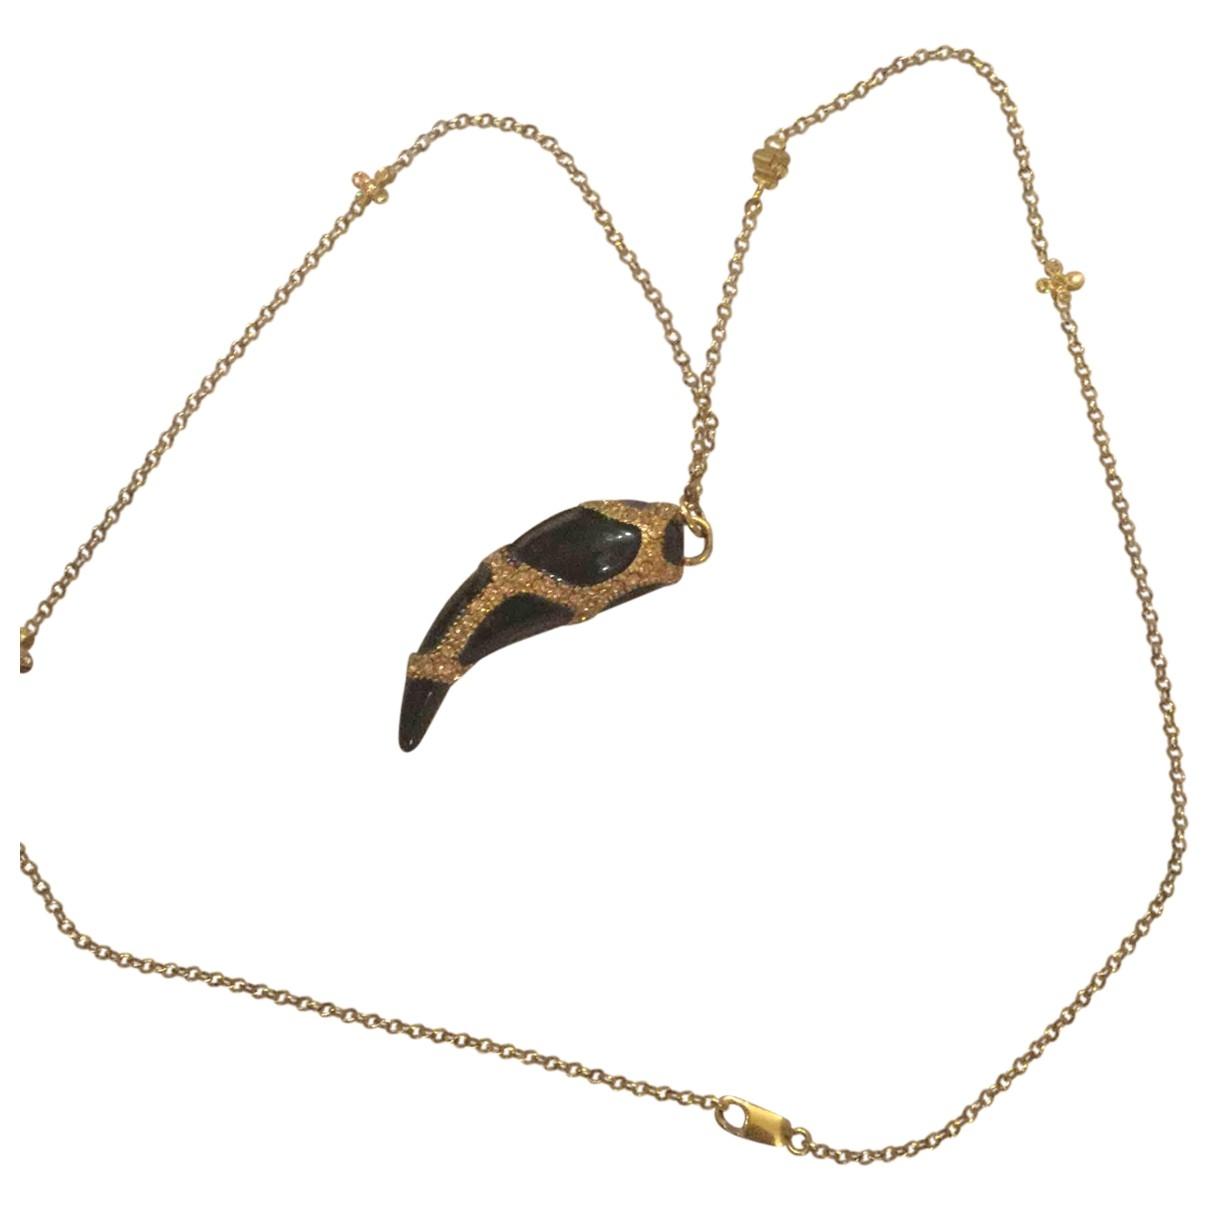 Collar Roberto Cavalli